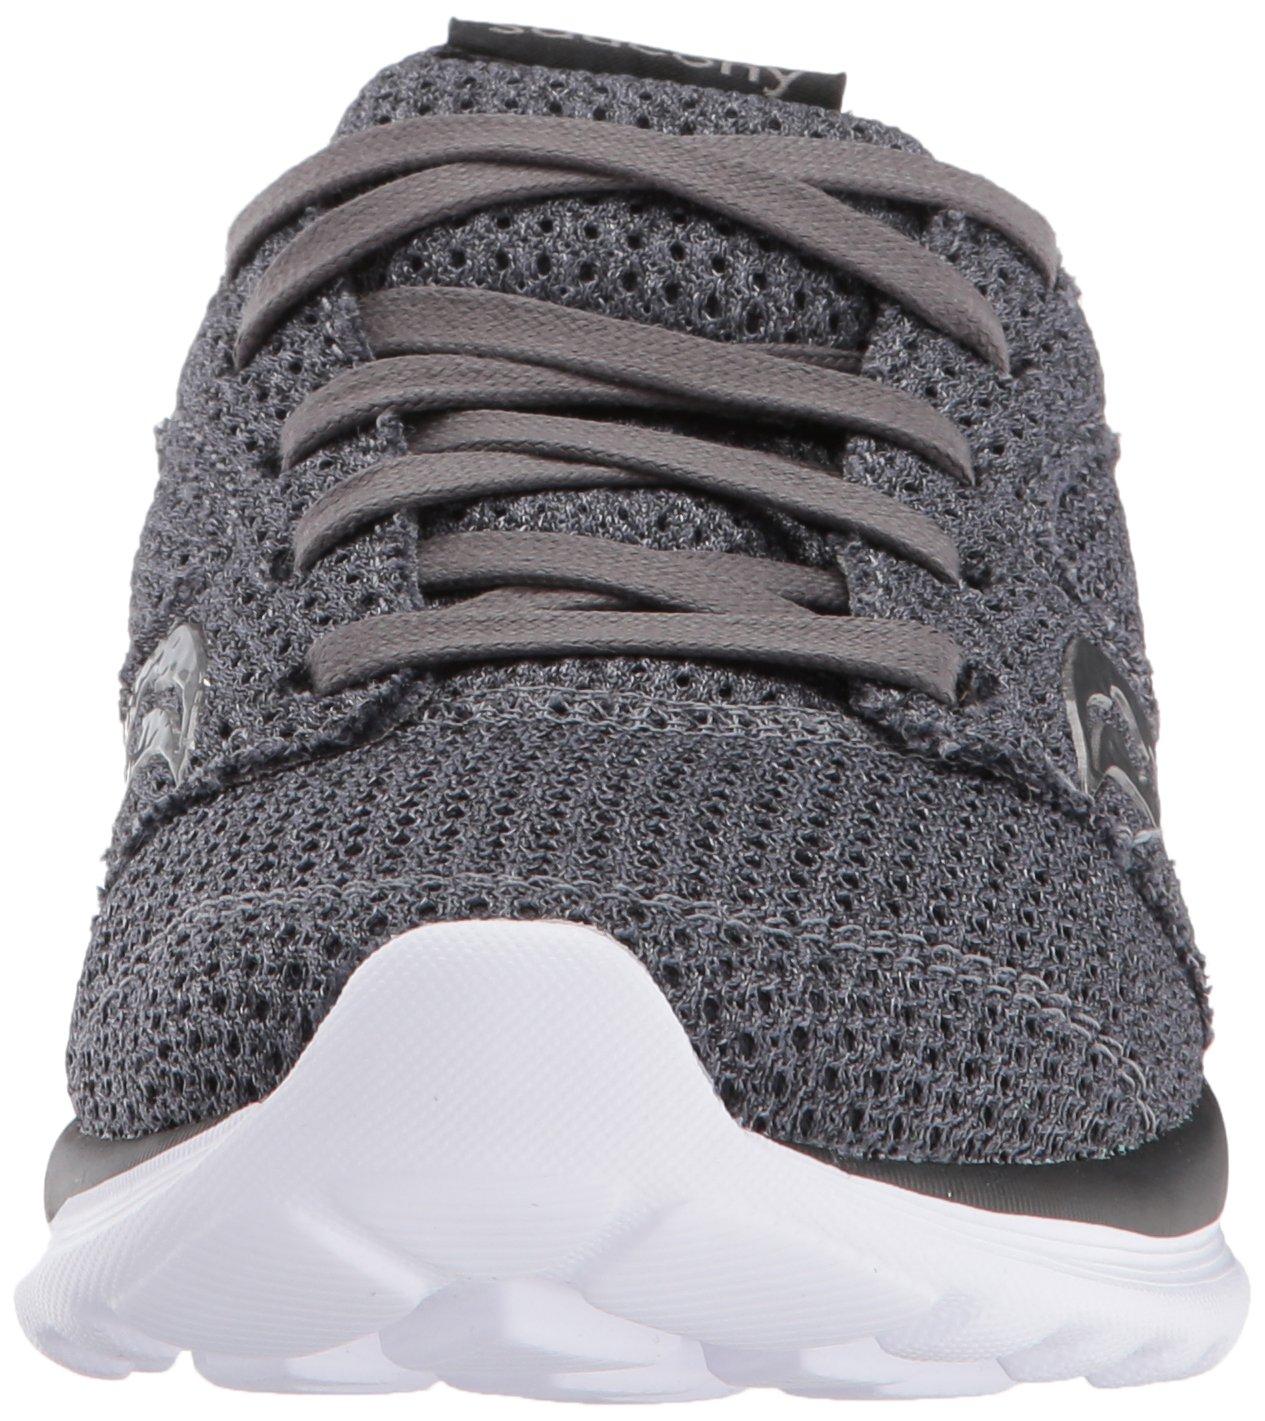 Saucony Women's Kineta Relay Running Shoe B072JTV5ZD 12 B(M) US Charcoal